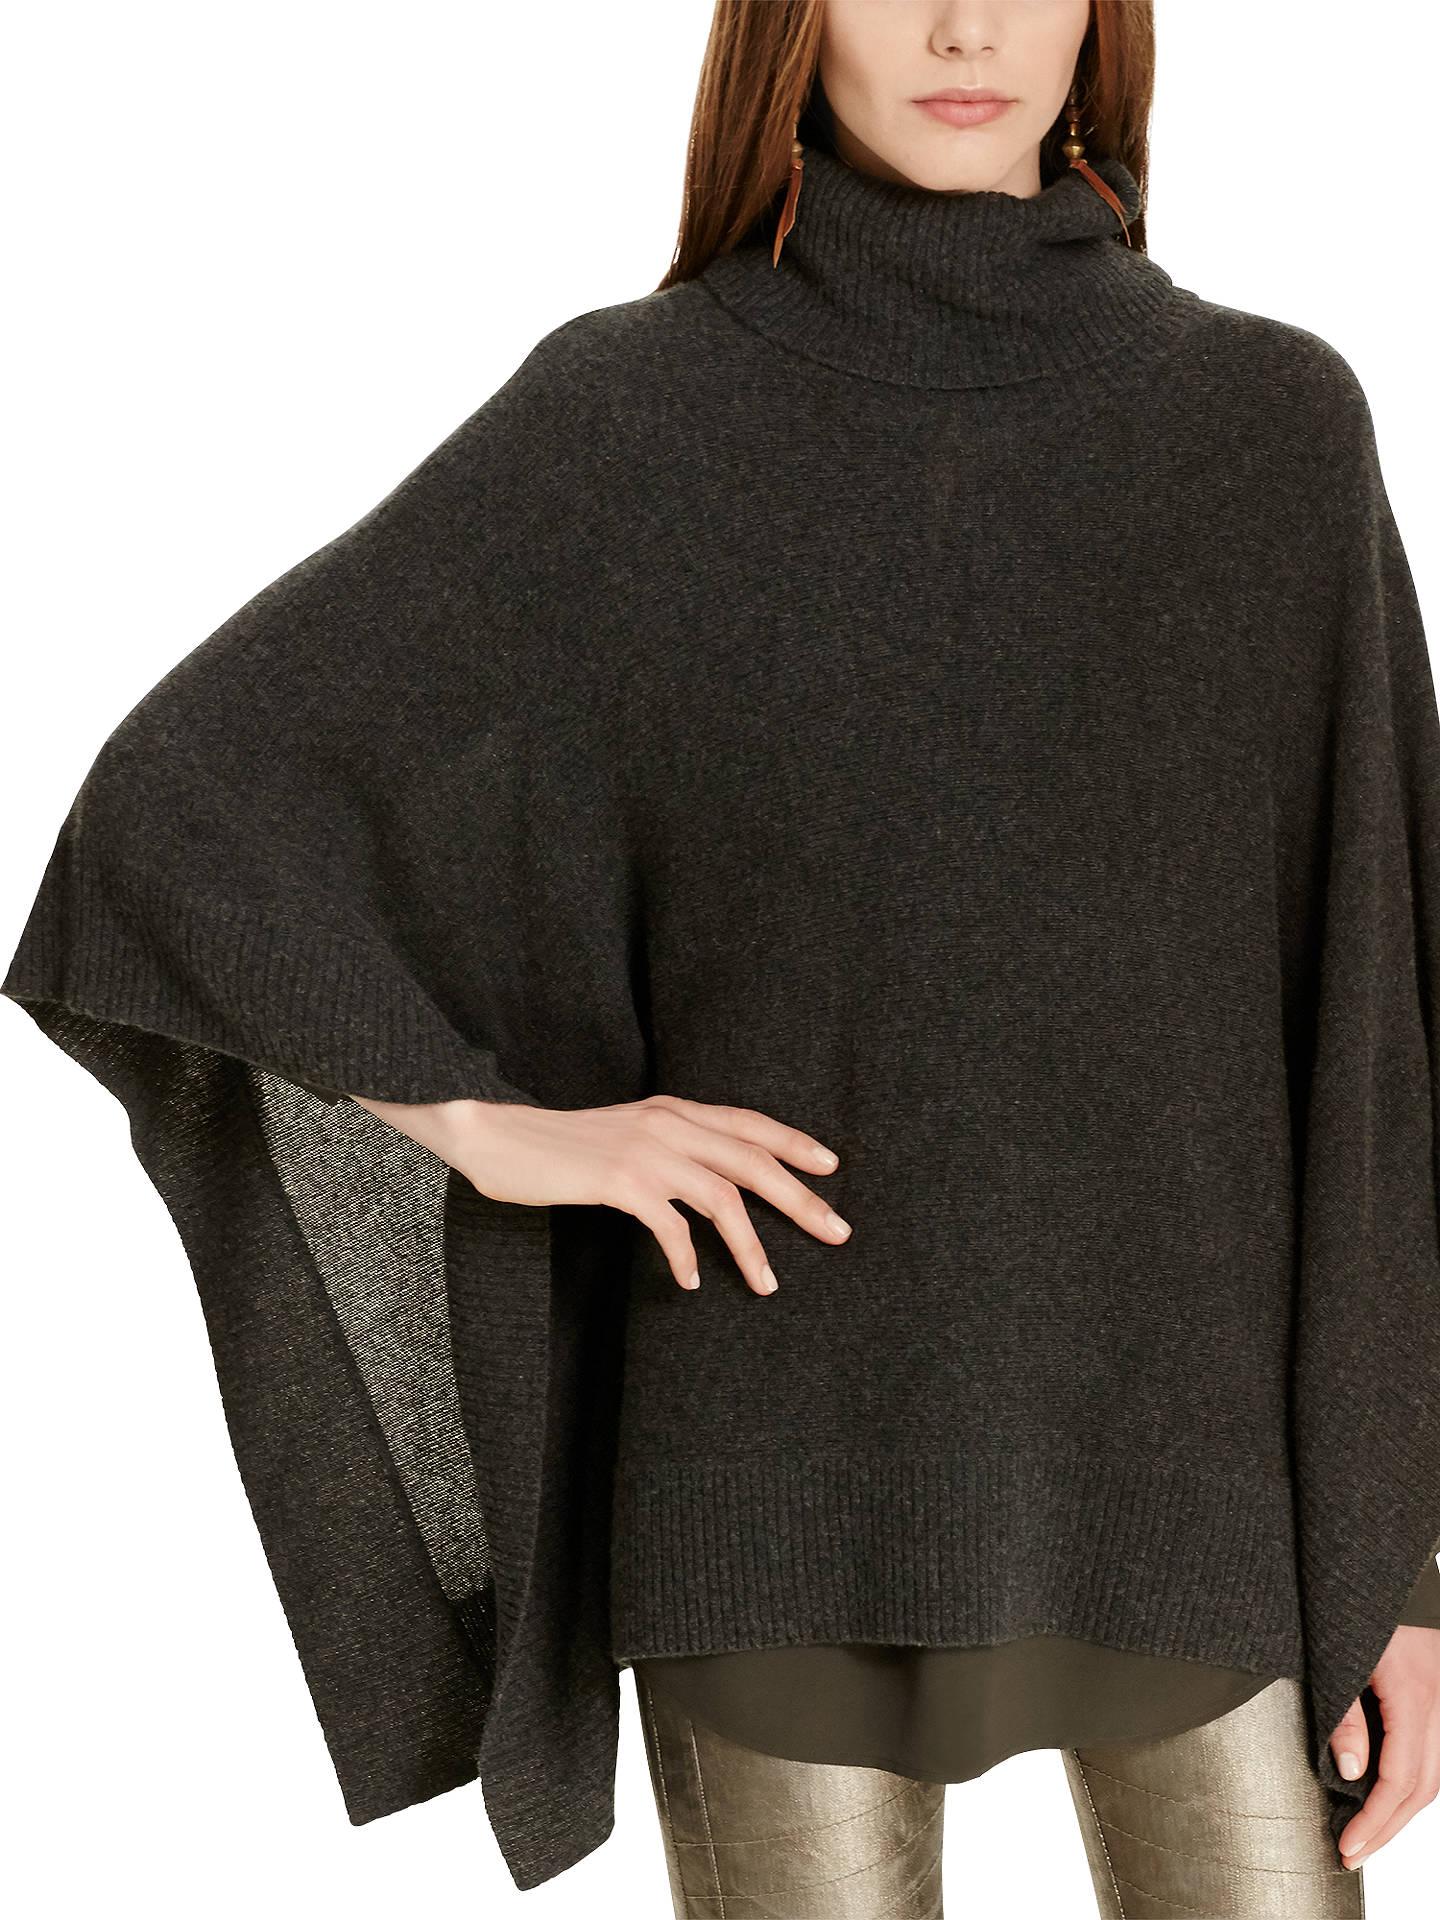 how to buy classic fit aliexpress Polo Ralph Lauren Boxy Cashmere Poncho, Dark Smoke Heather ...